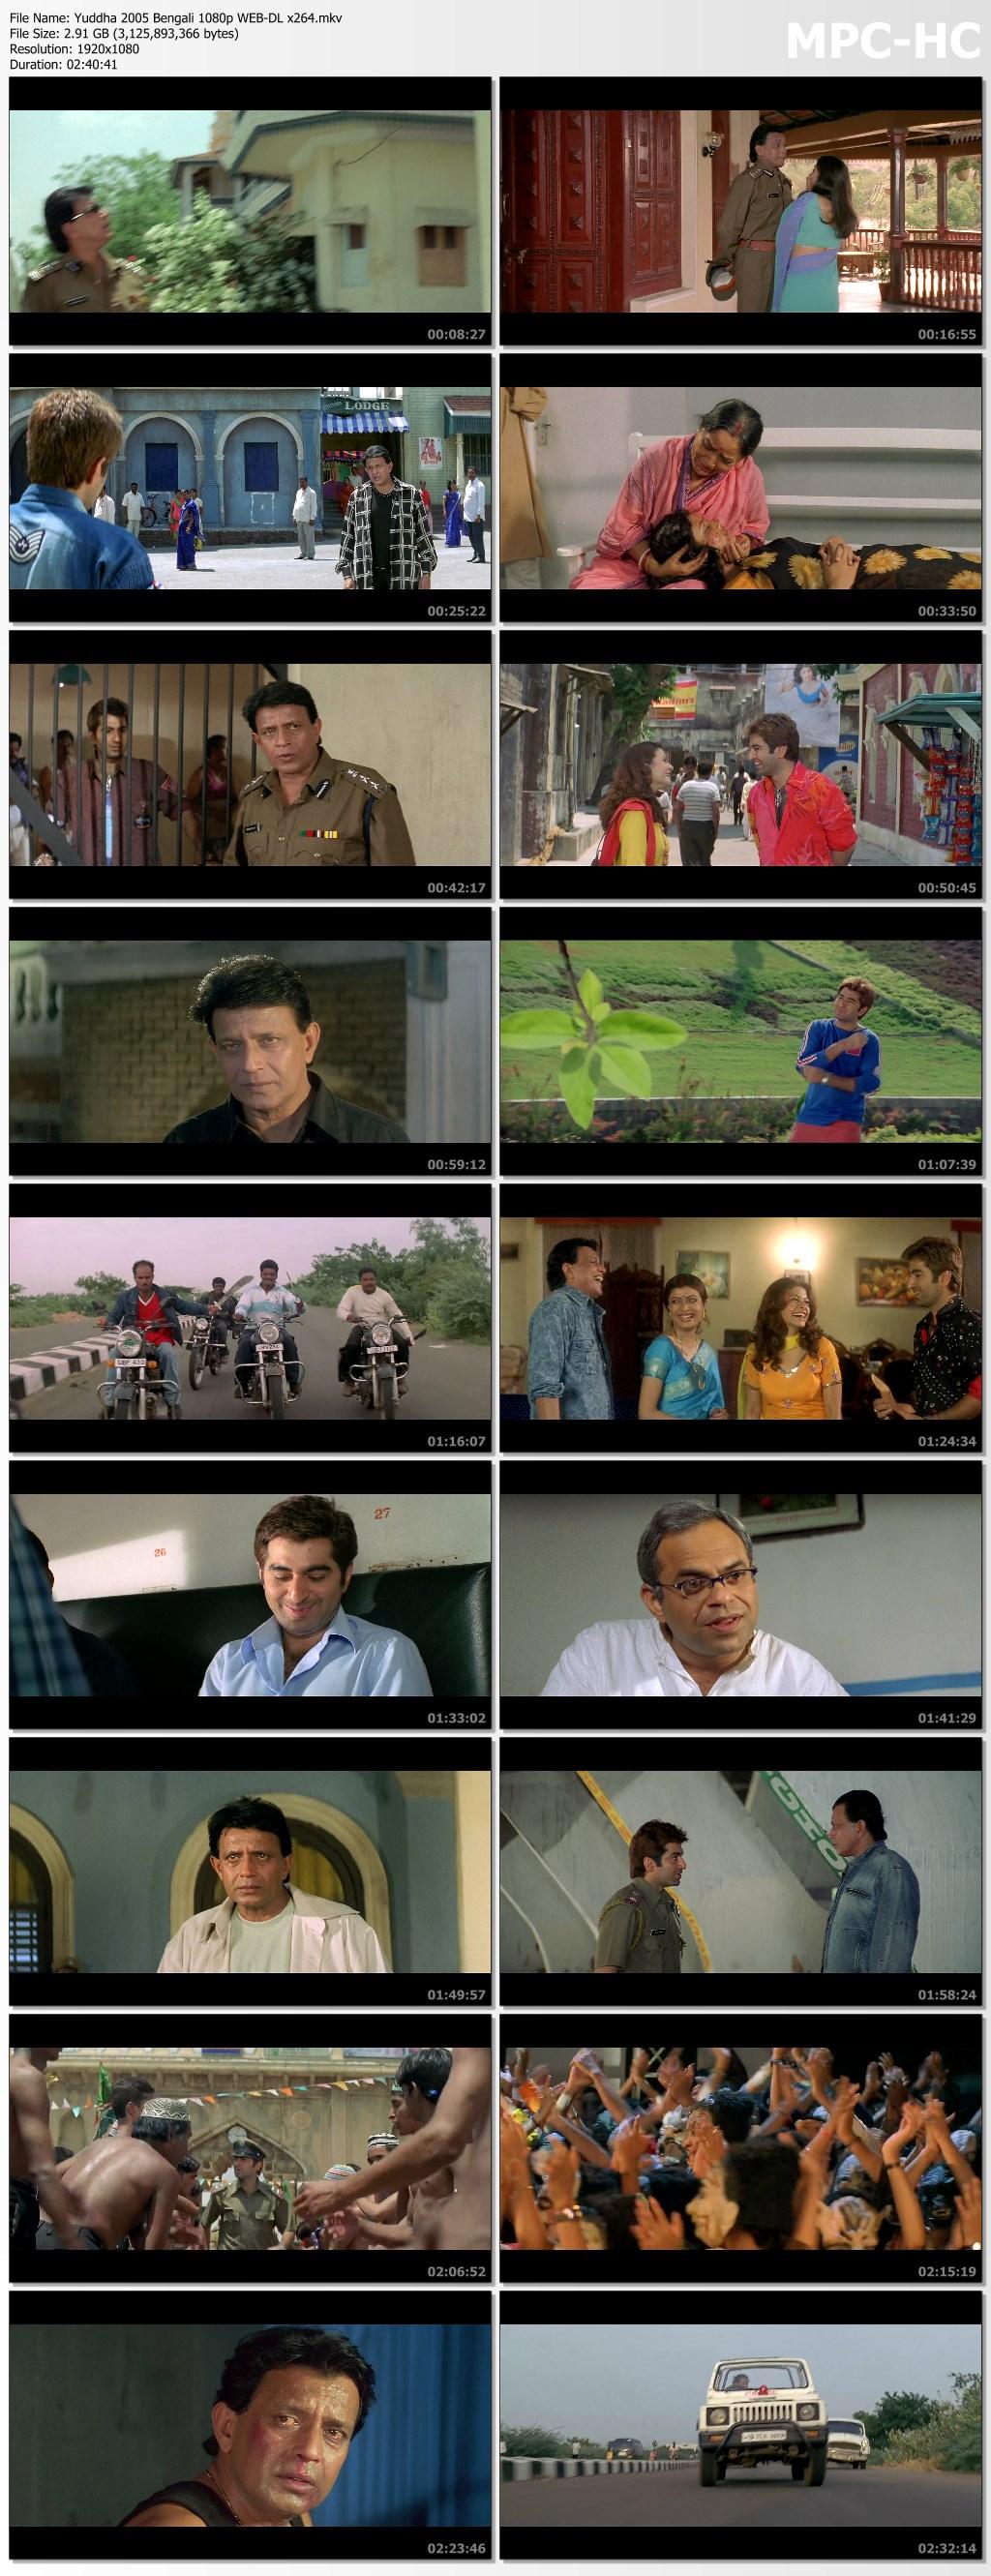 Yuddha 2005 Bengali 1080p WEB DL x264.mkv thumbs